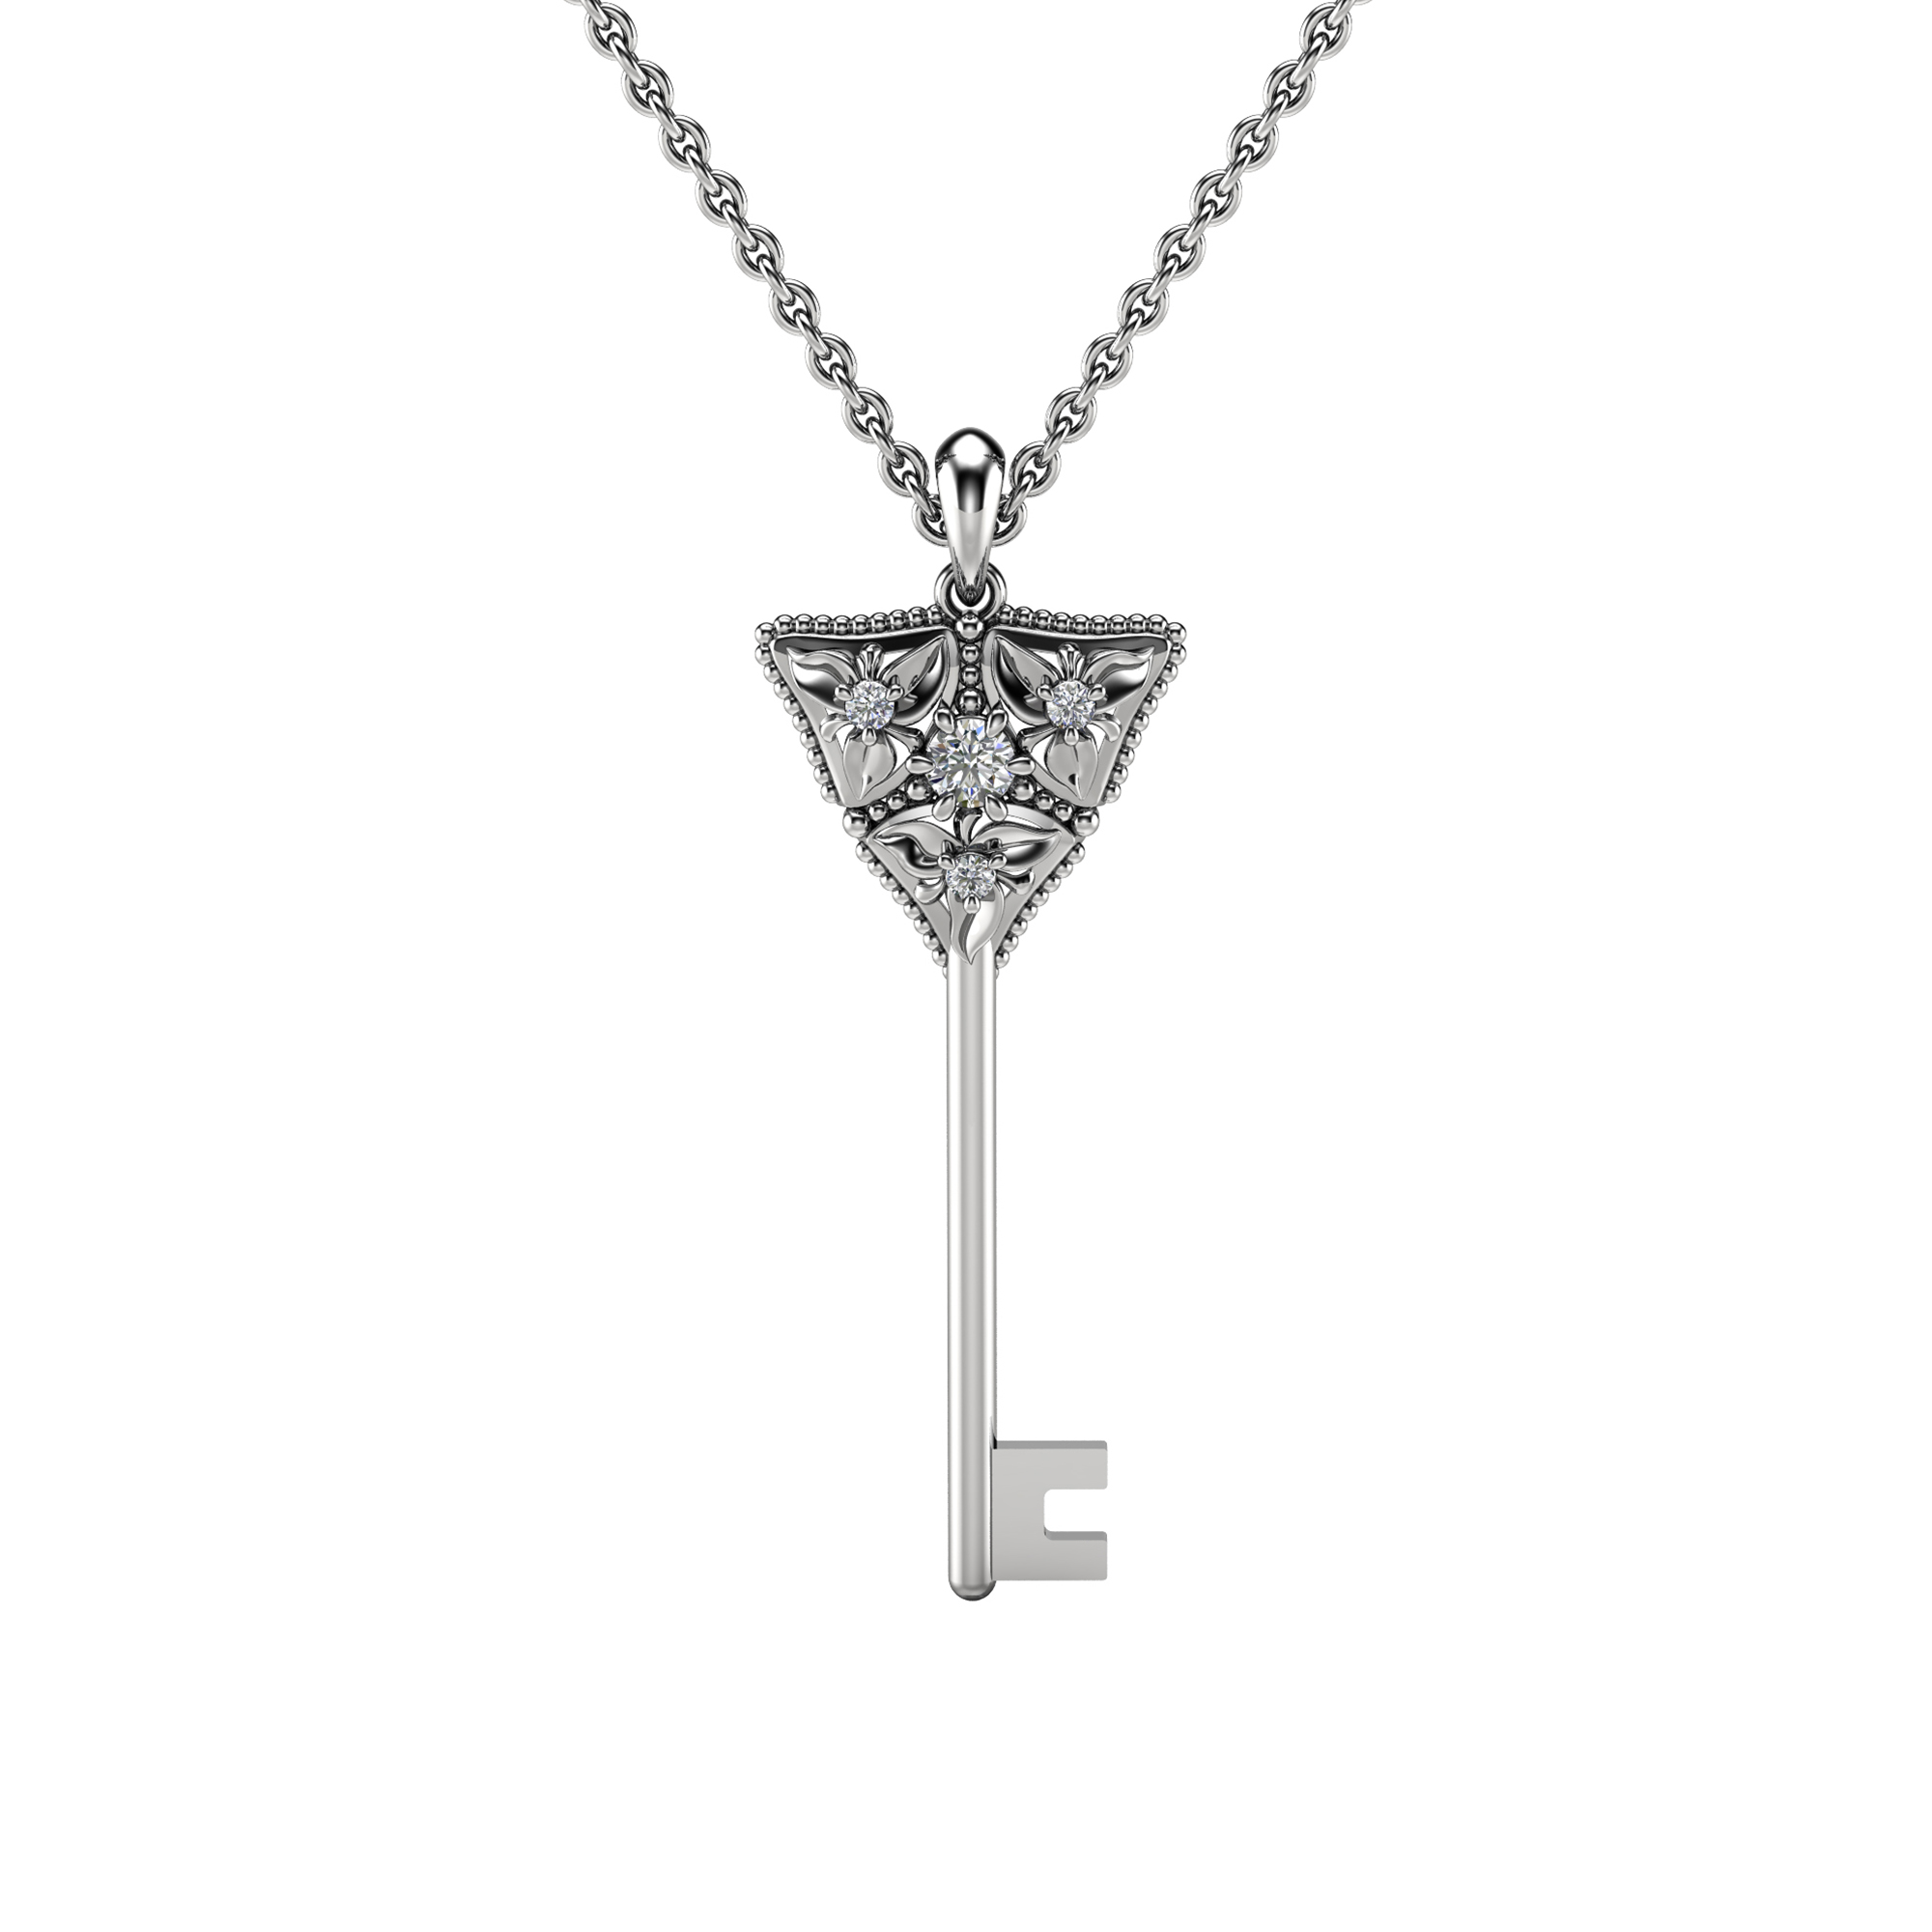 Diamond Key Pendant Necklace Diamond Pendant 14K White Gold Necklace Floral Diamonds Key Pendant